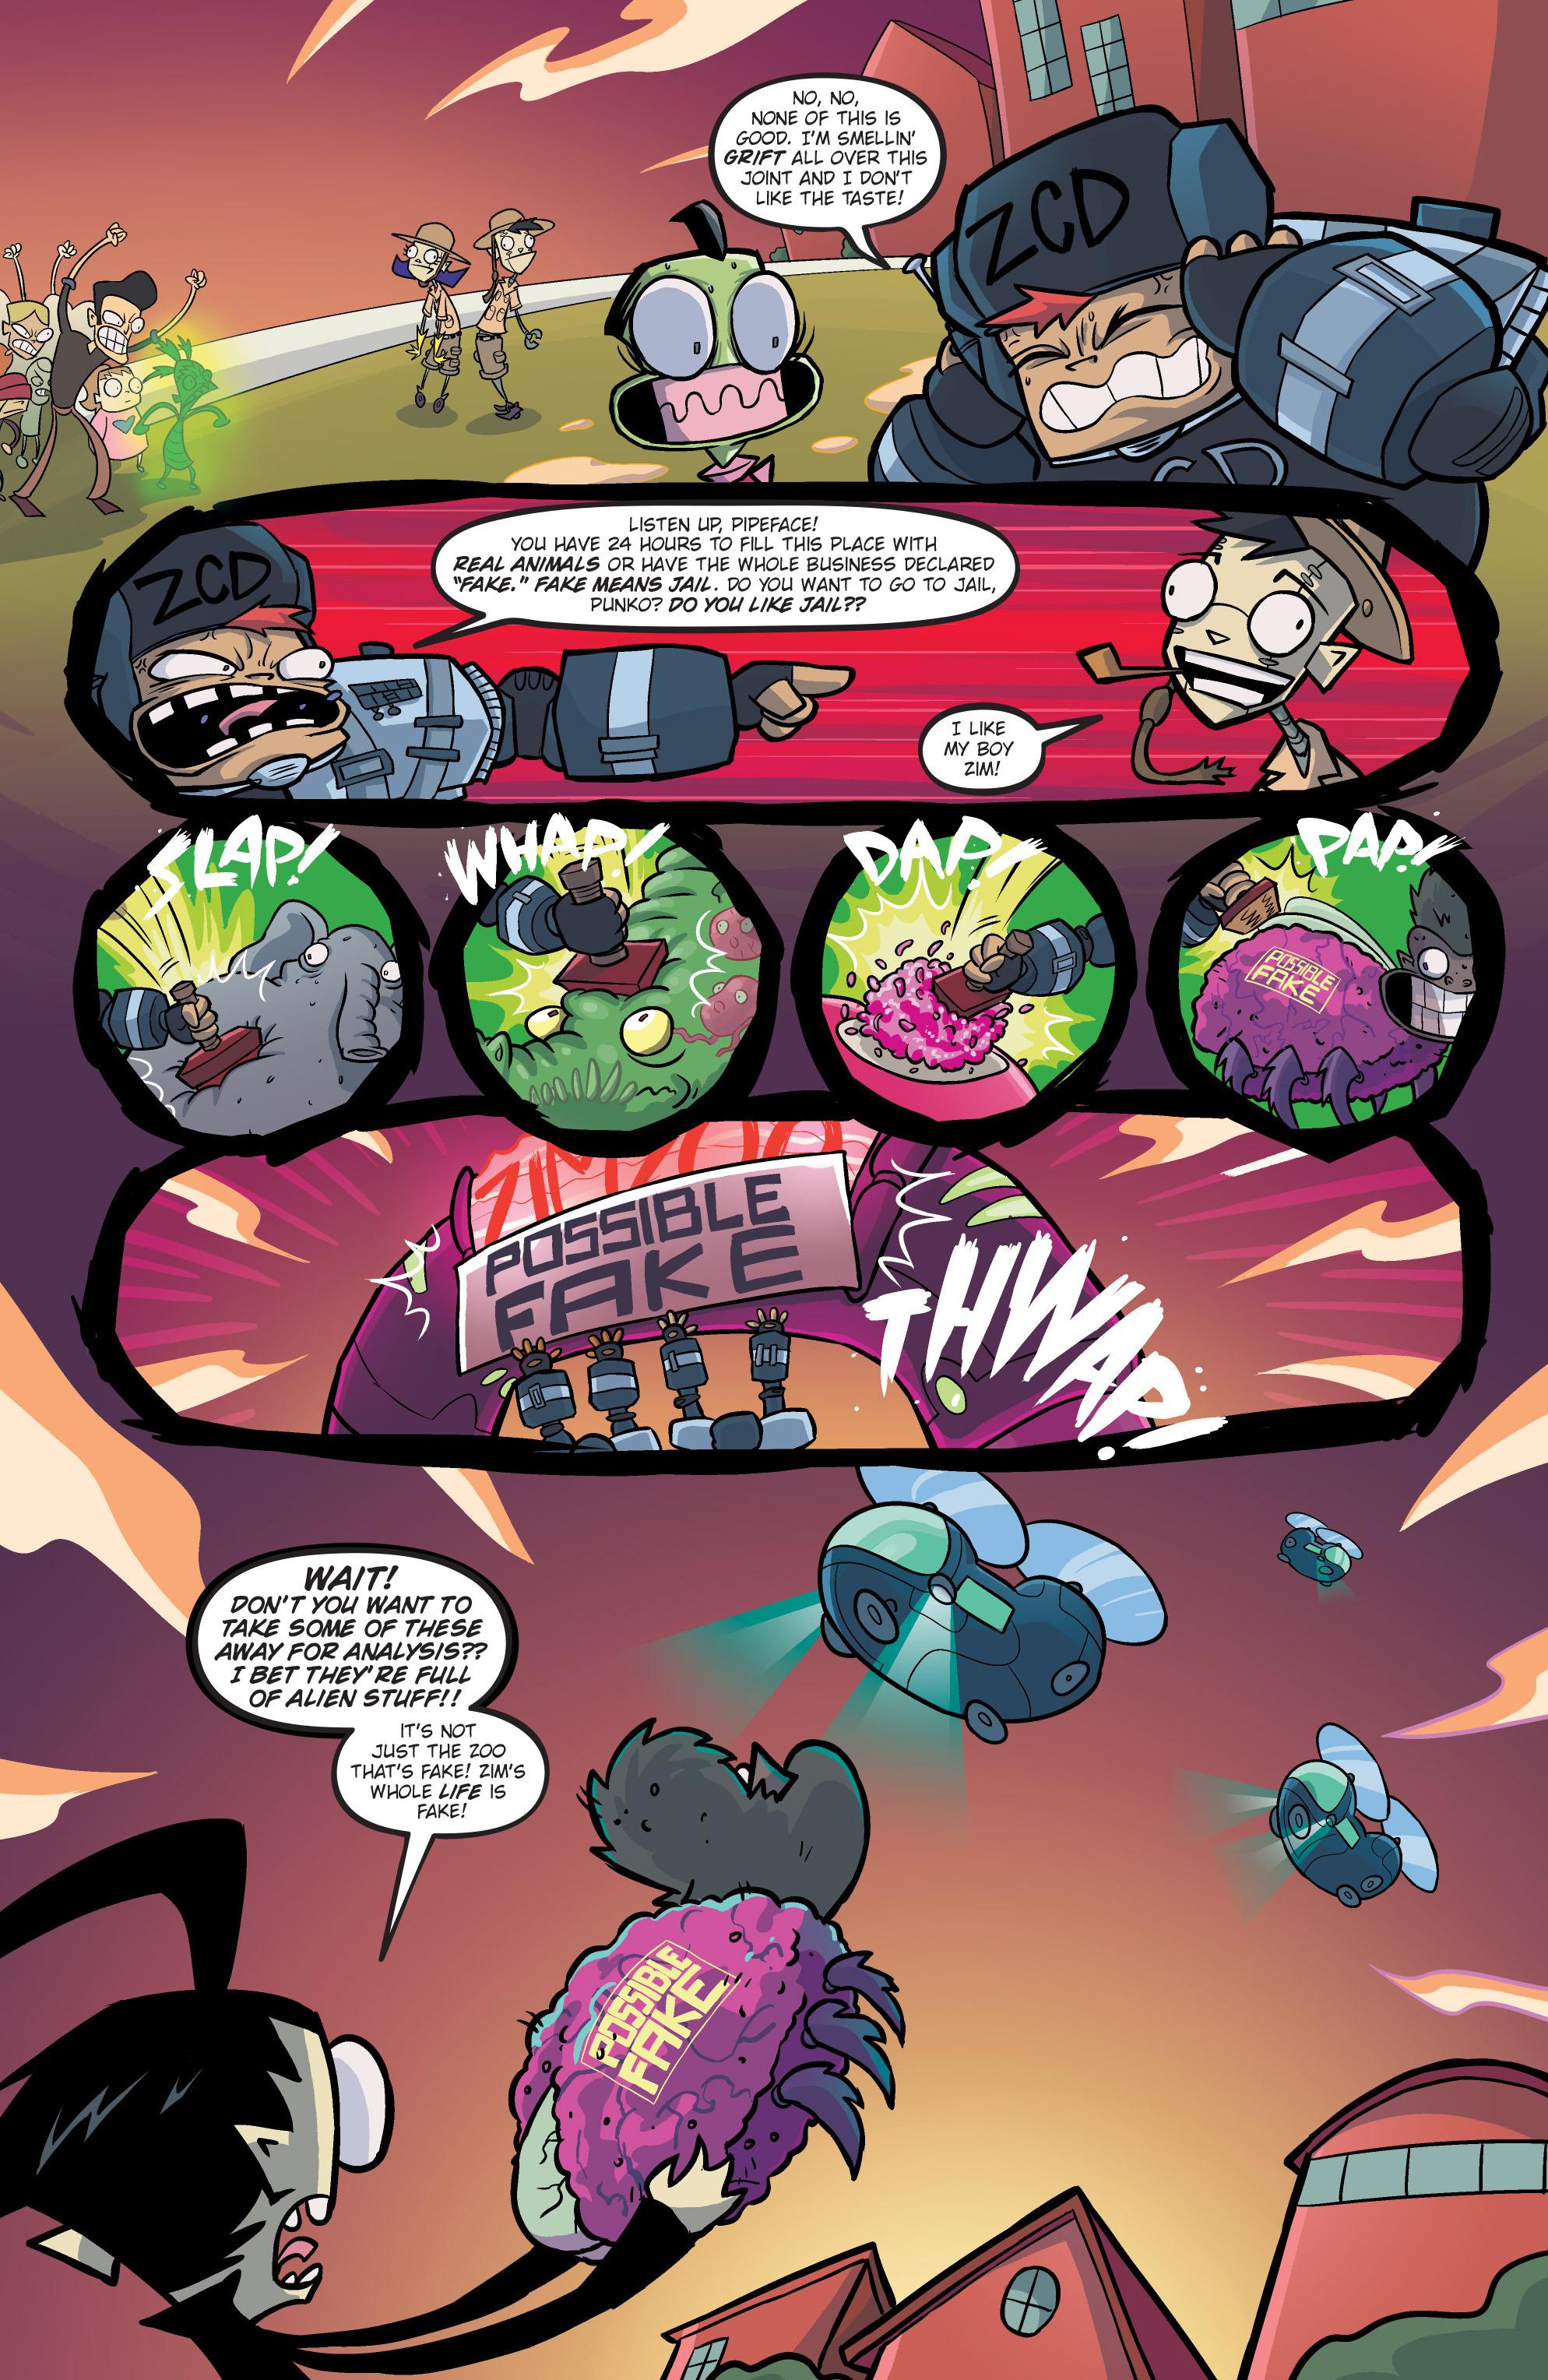 Read online Invader Zim comic -  Issue #19 - 16